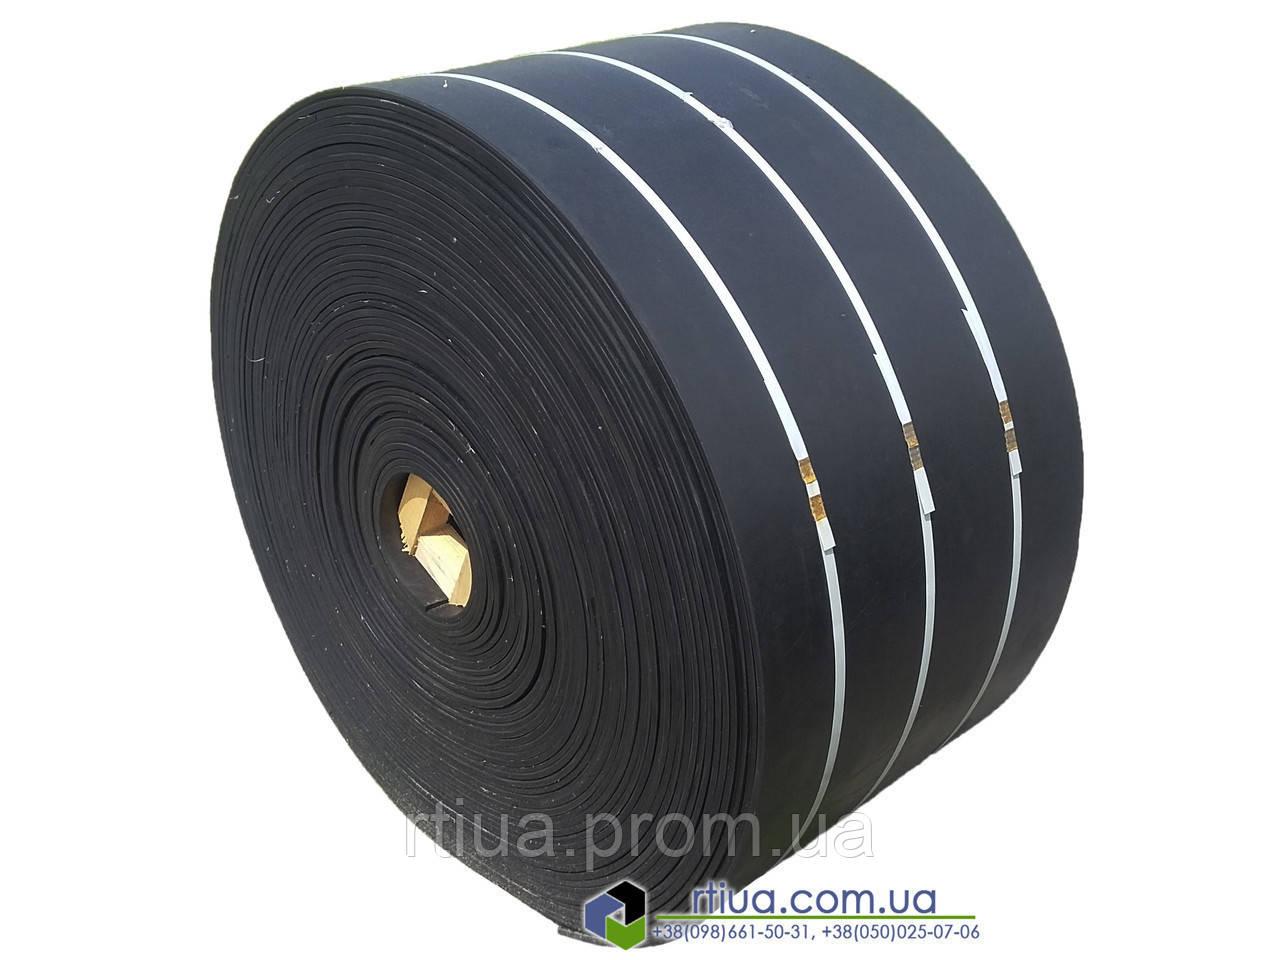 Конвейерная лента 1400х12 мм